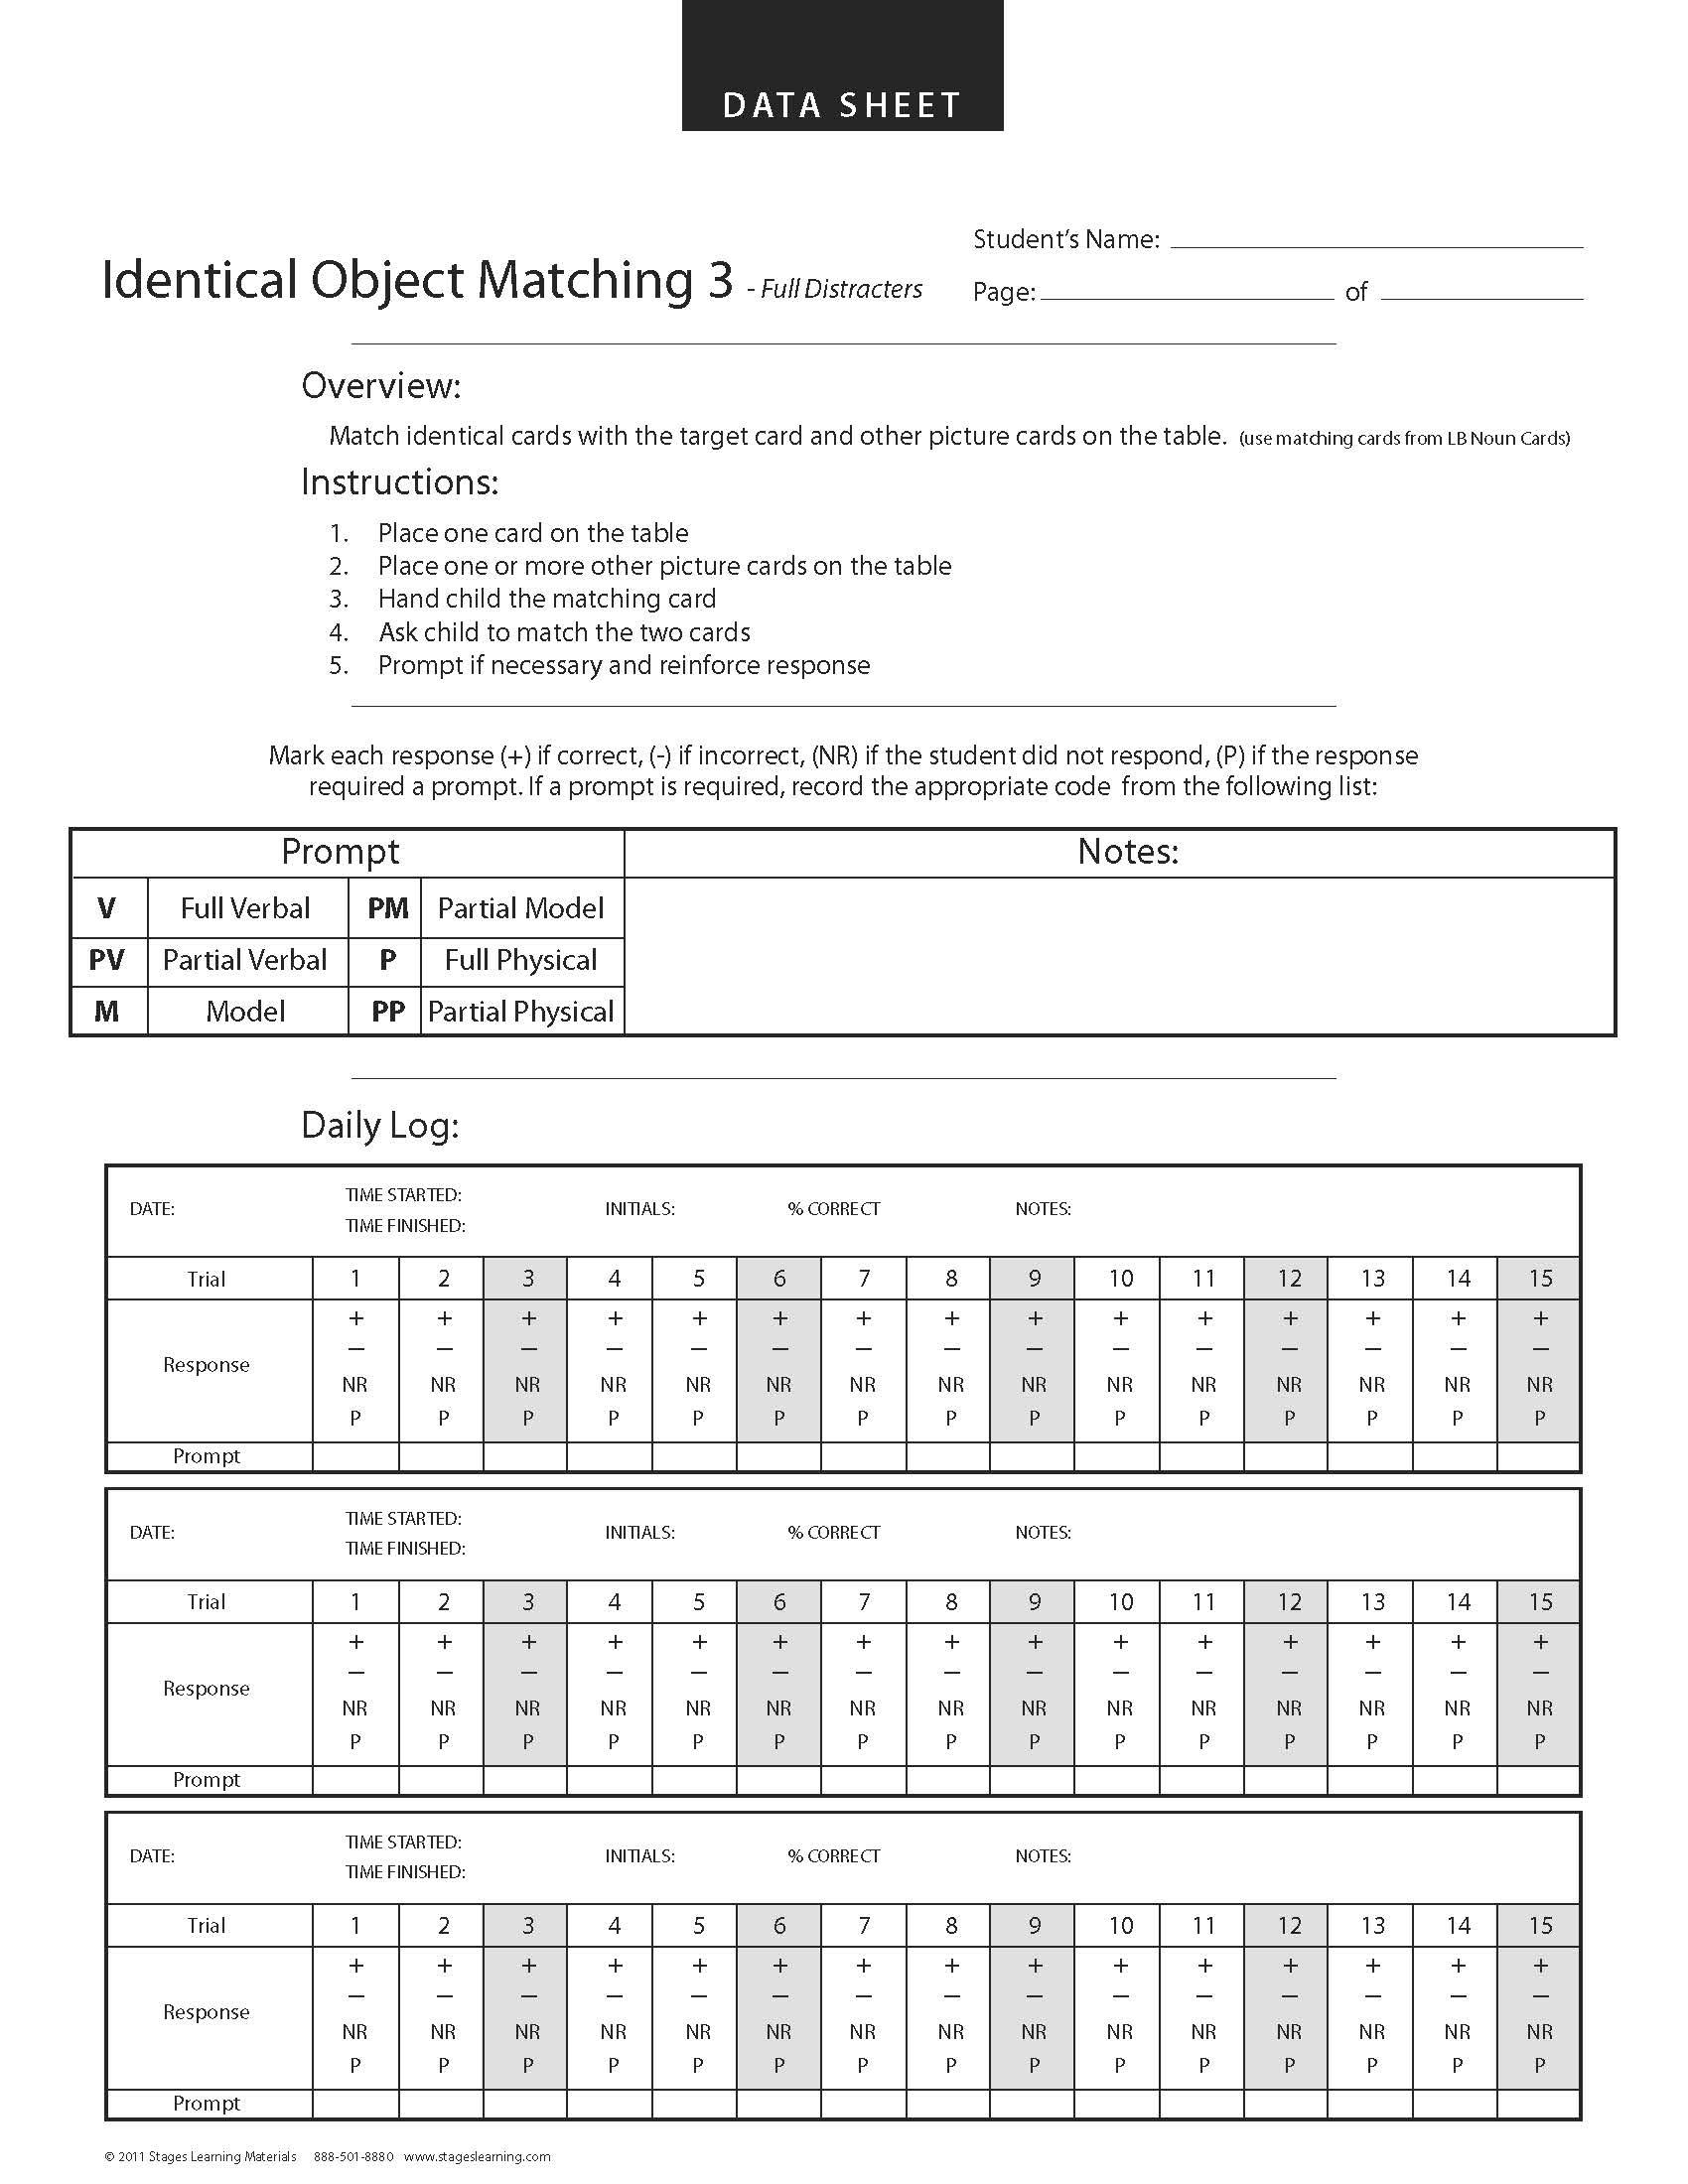 Identical matching aba data sheet